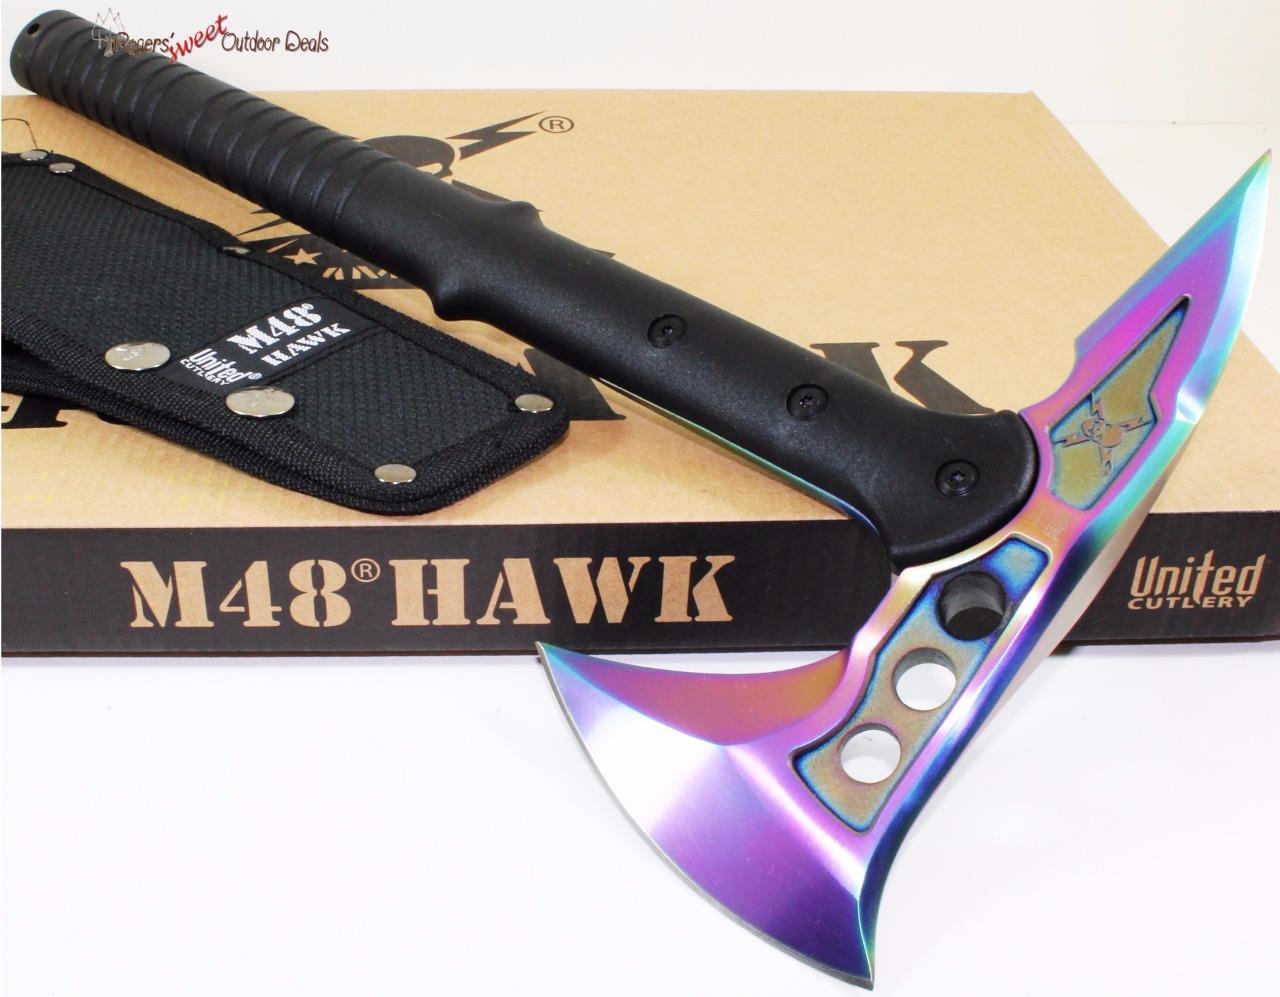 M48 Knife – Wonderful Image Gallery